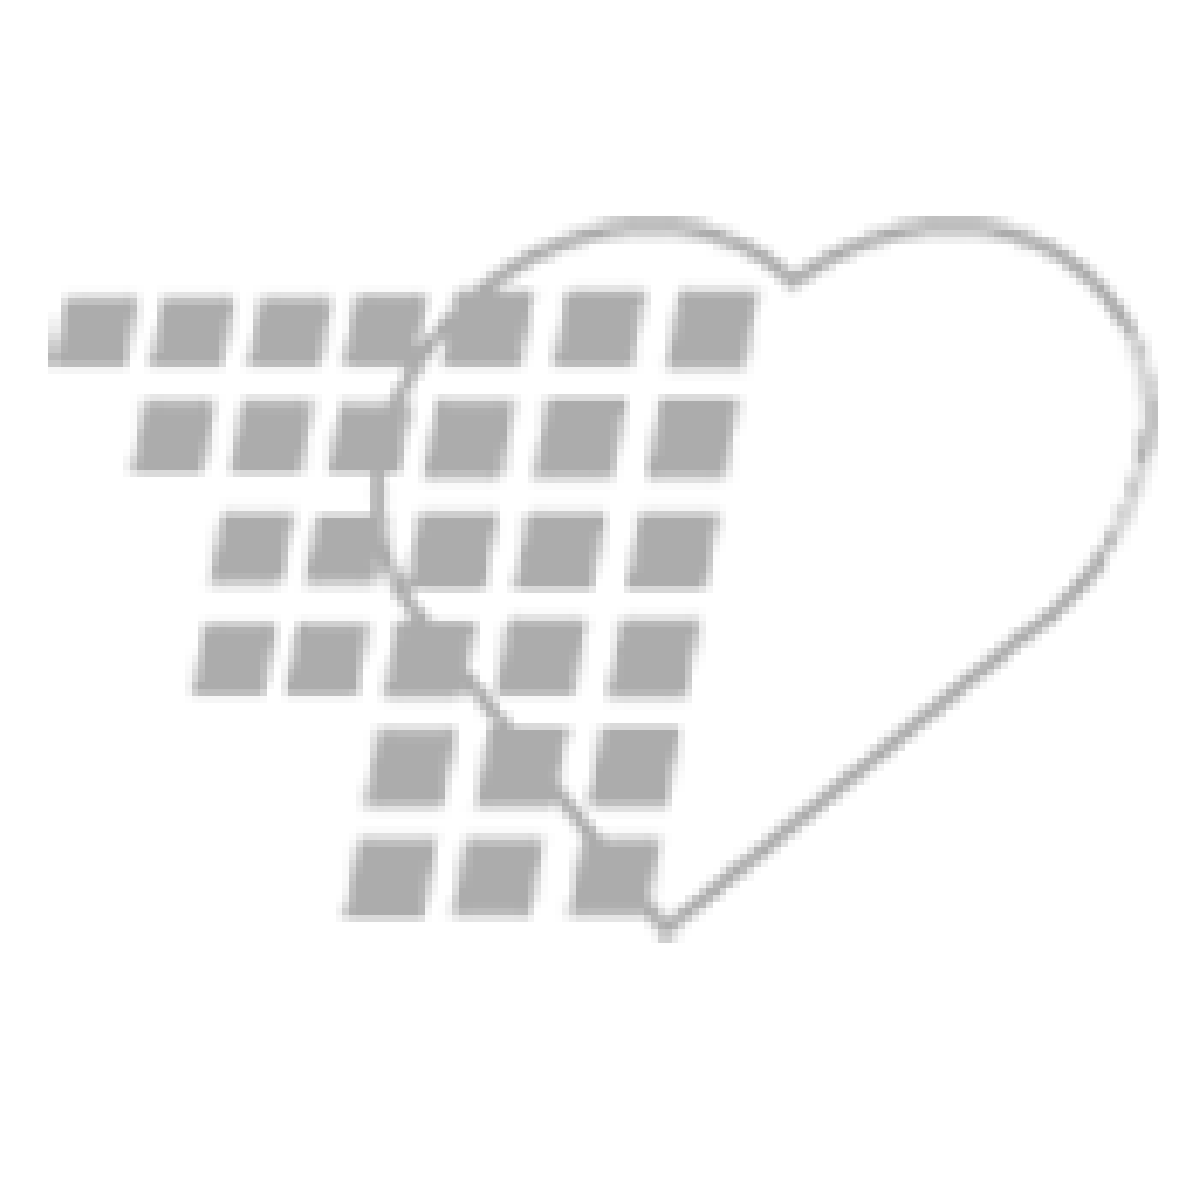 12-44-1178 Lifesaver CPR Board